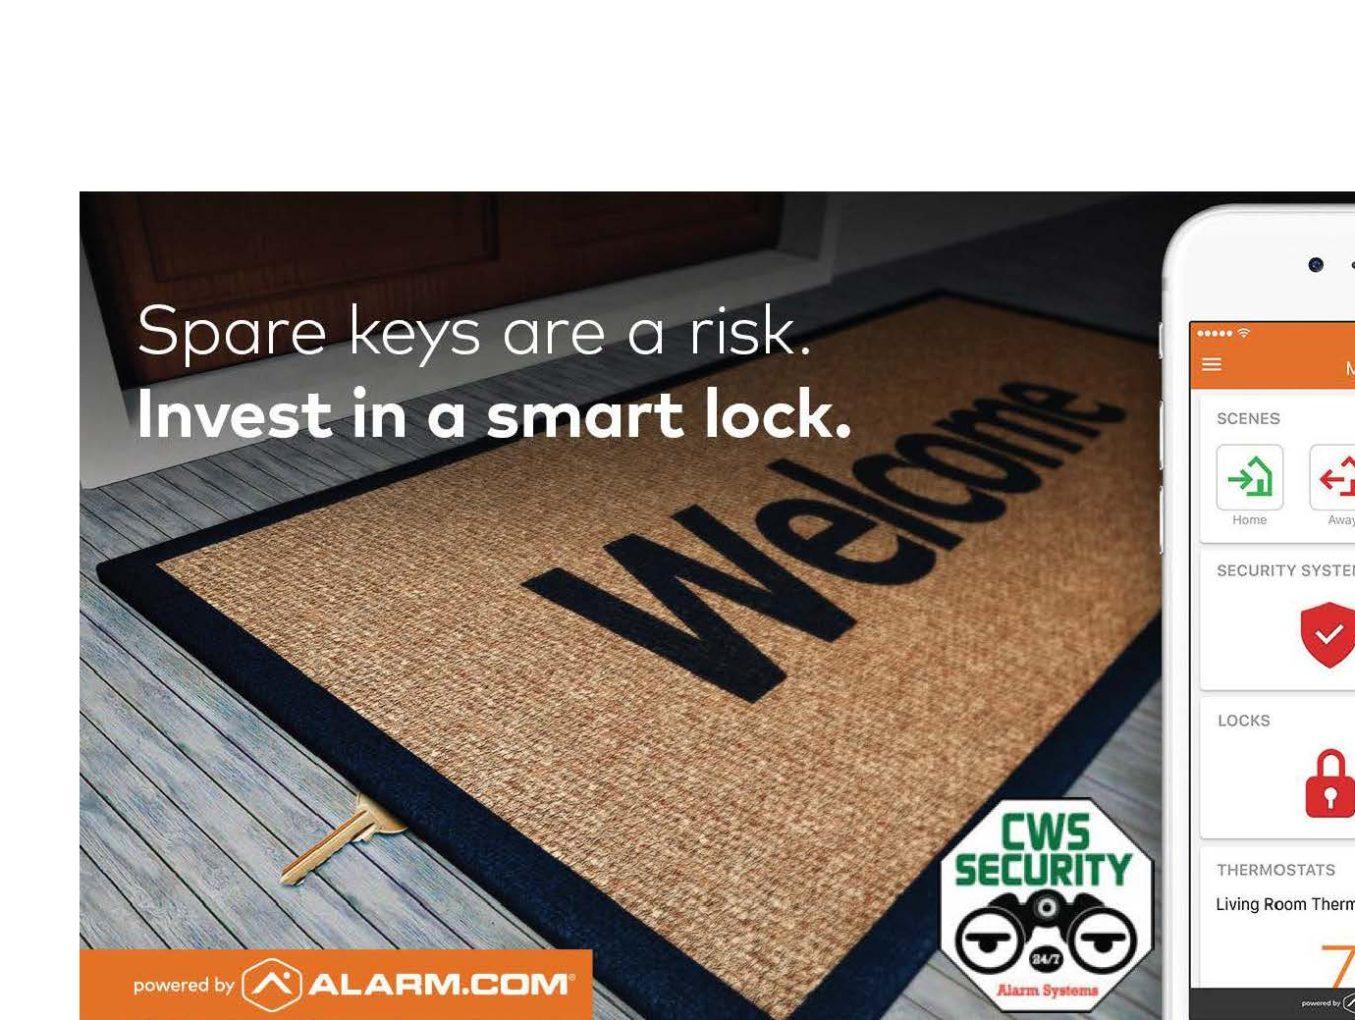 Smart Home Security Versus… Spare Keys